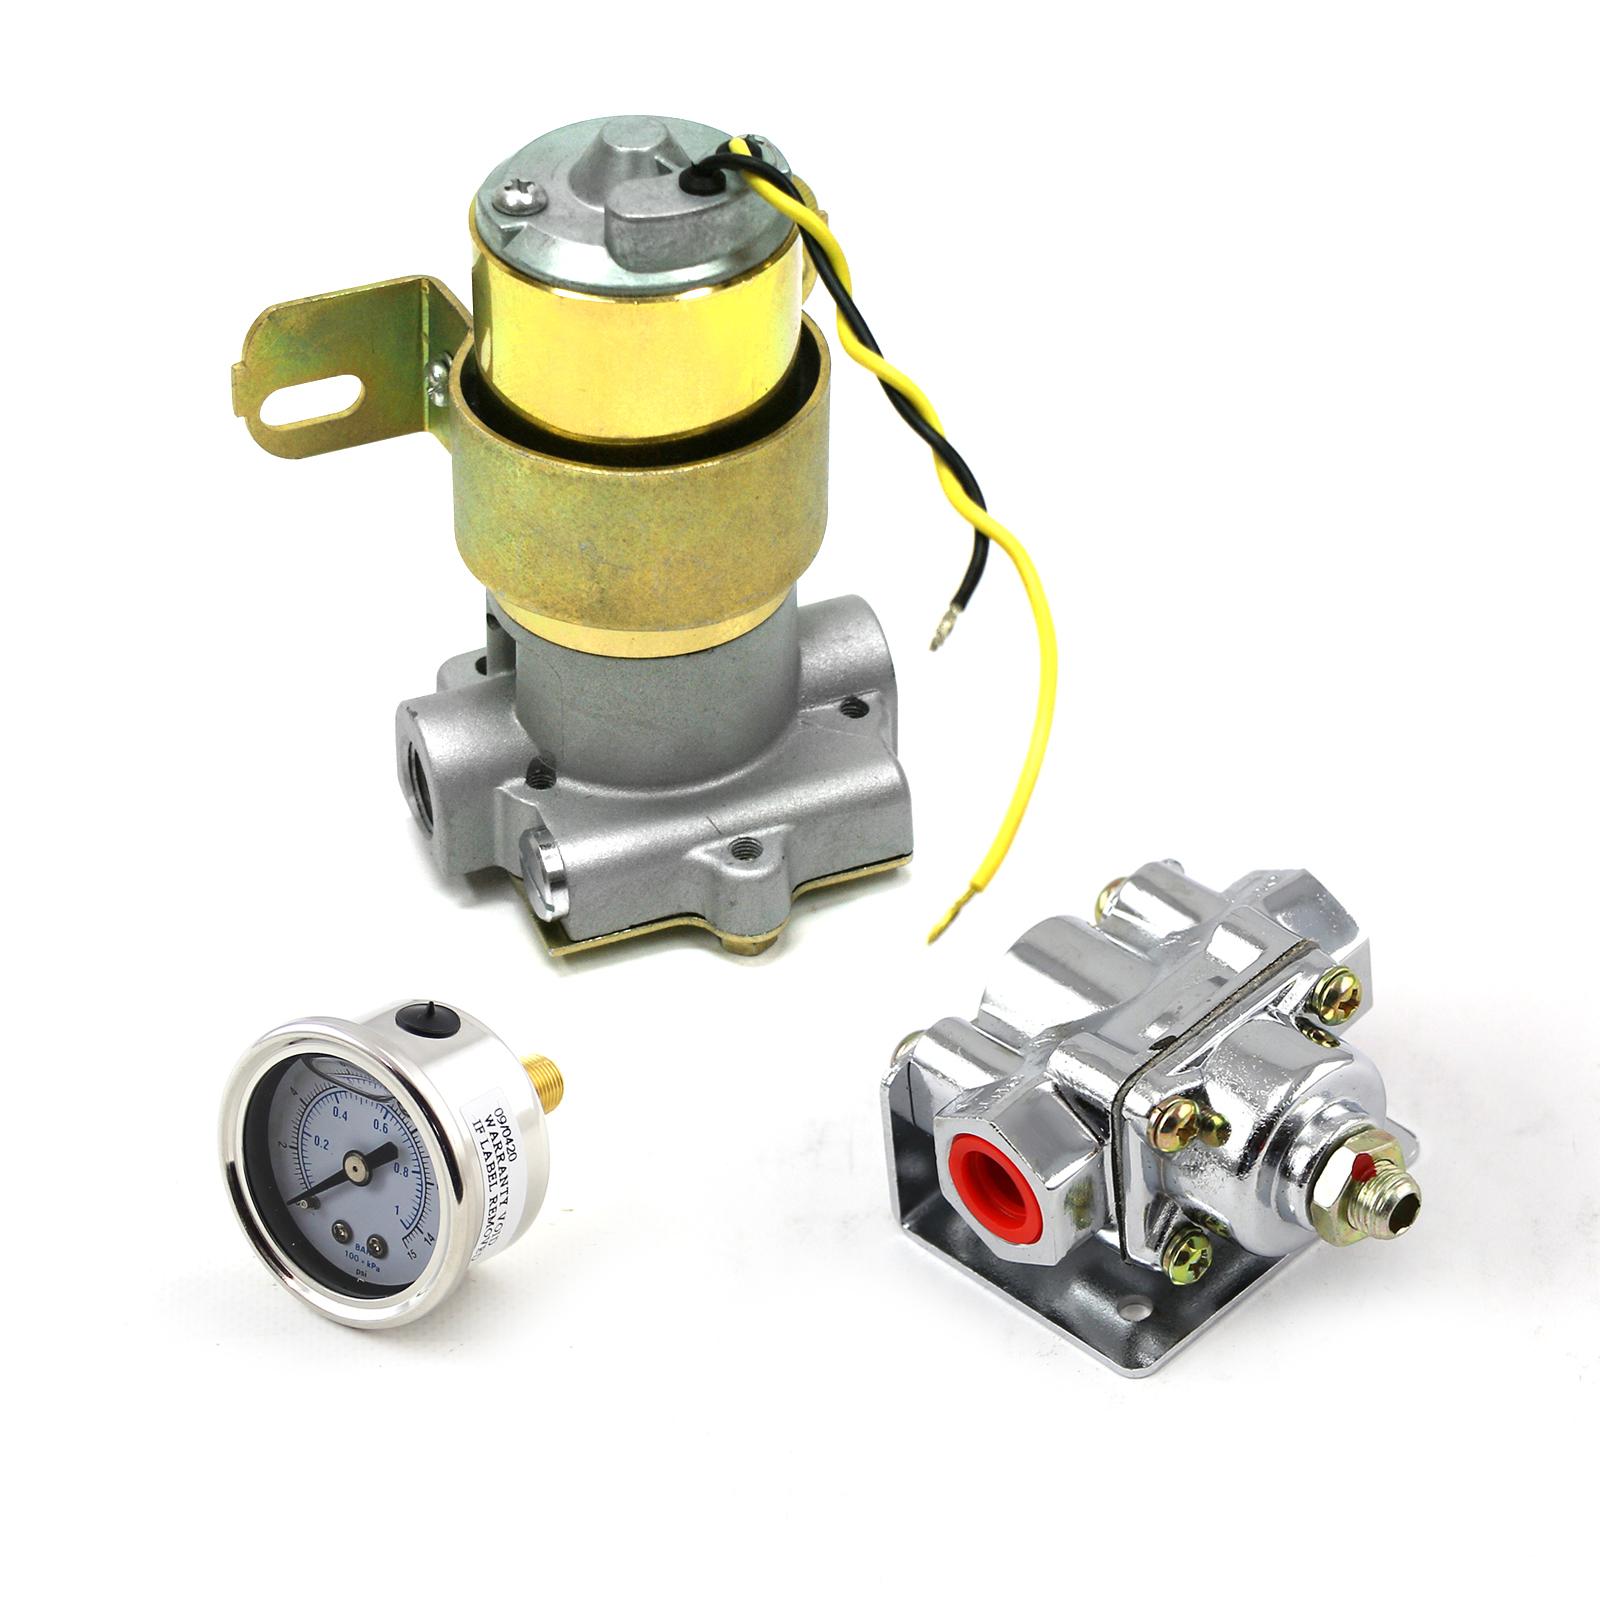 95 Gph Universal Electric Fuel Pump Chrome Regulator & Gauge Combo Kit